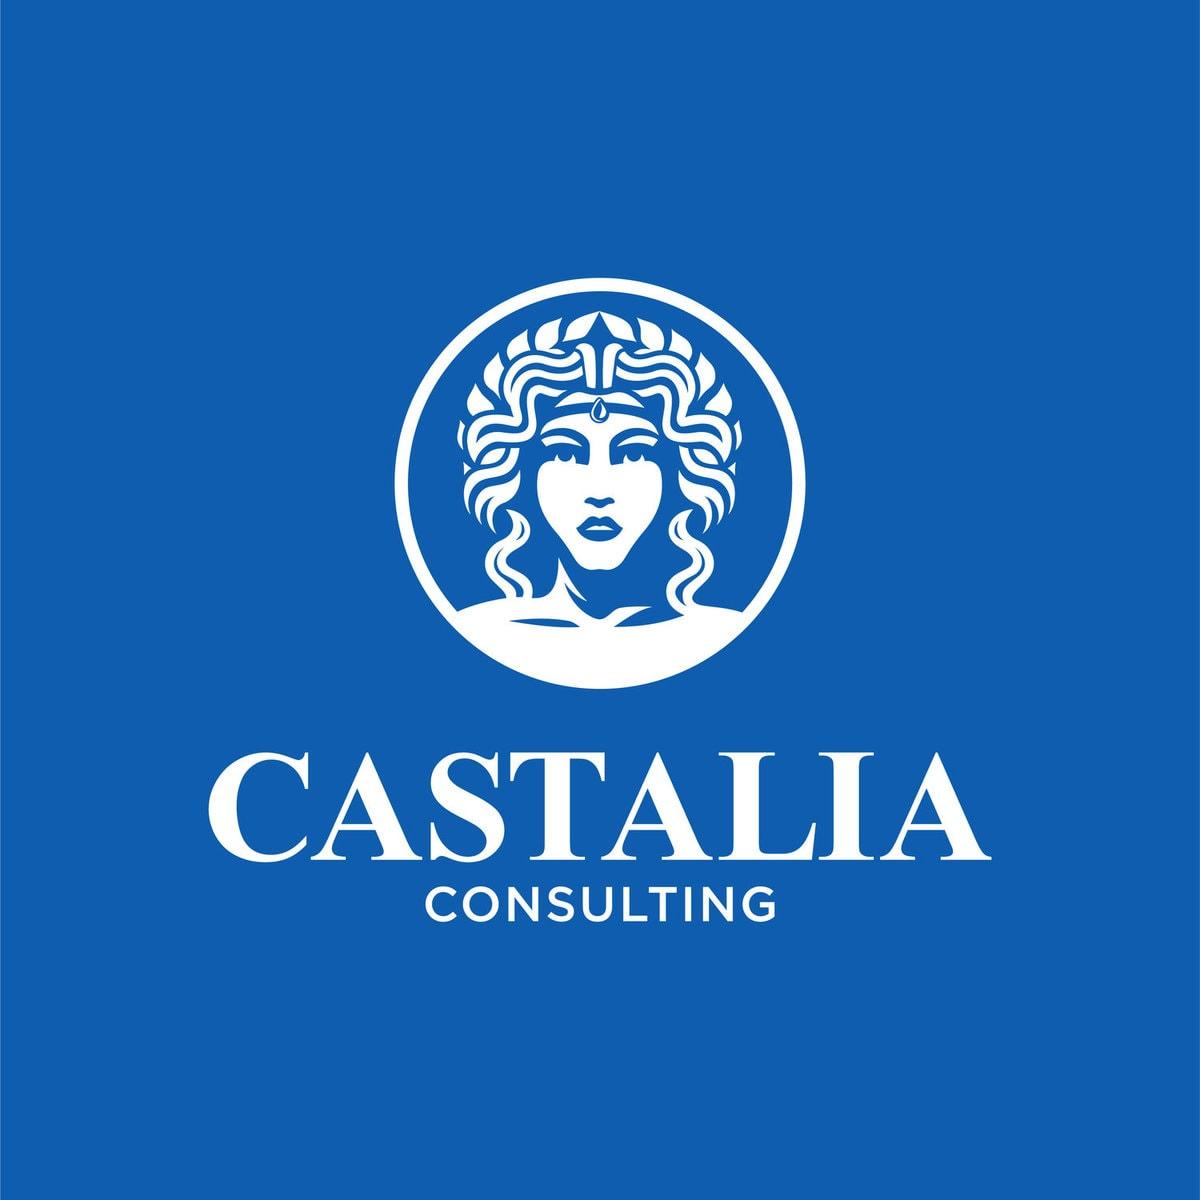 Corporate Identity for Castalia Consulting Inc.